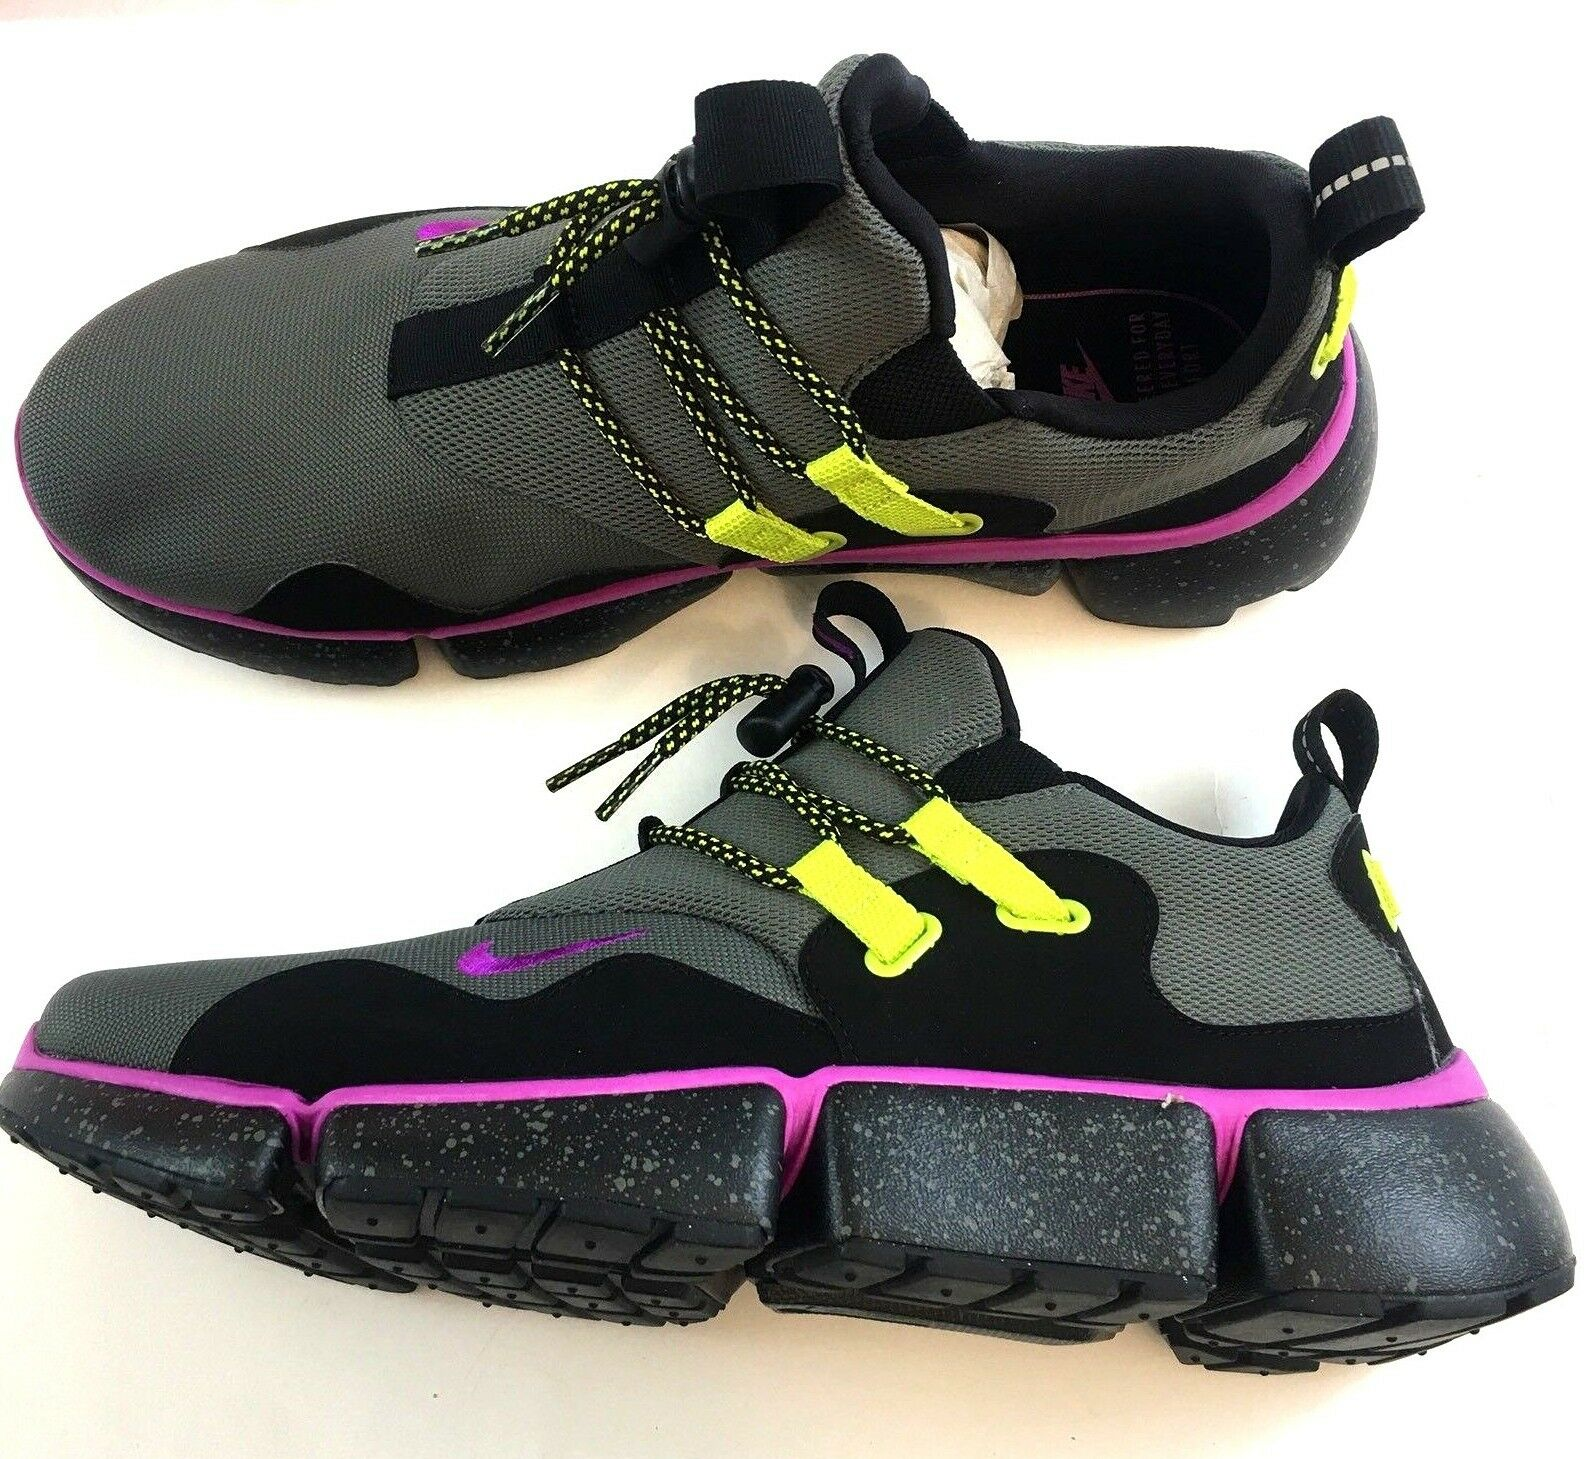 New  130 Nike Mens 11.5 Pocketknife DM SU River Rock Hyper purple Black Sneakers